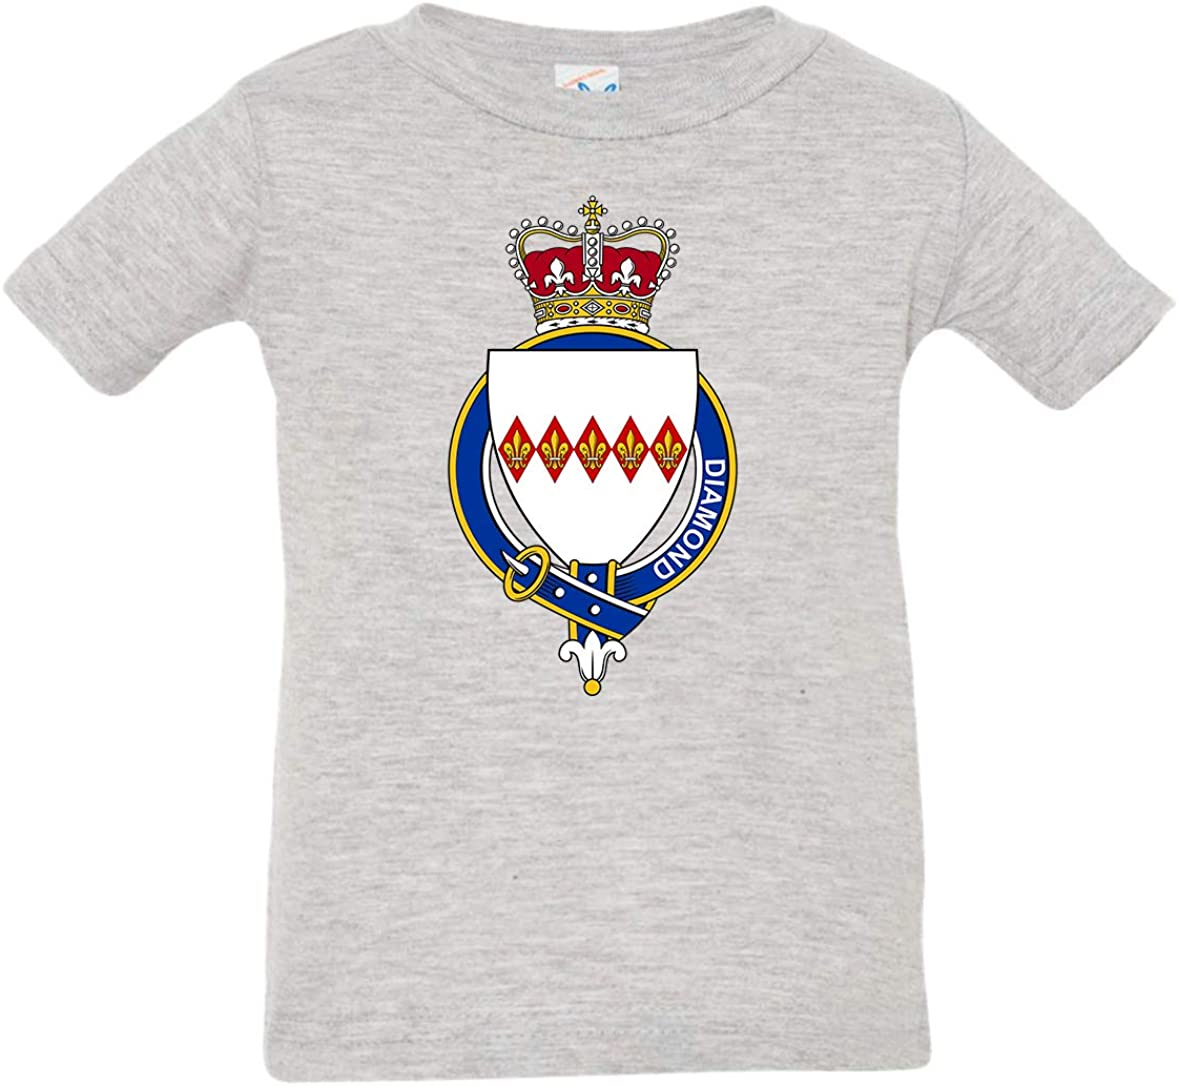 Tenacitee Babys English Garter Family Diamond Shirt